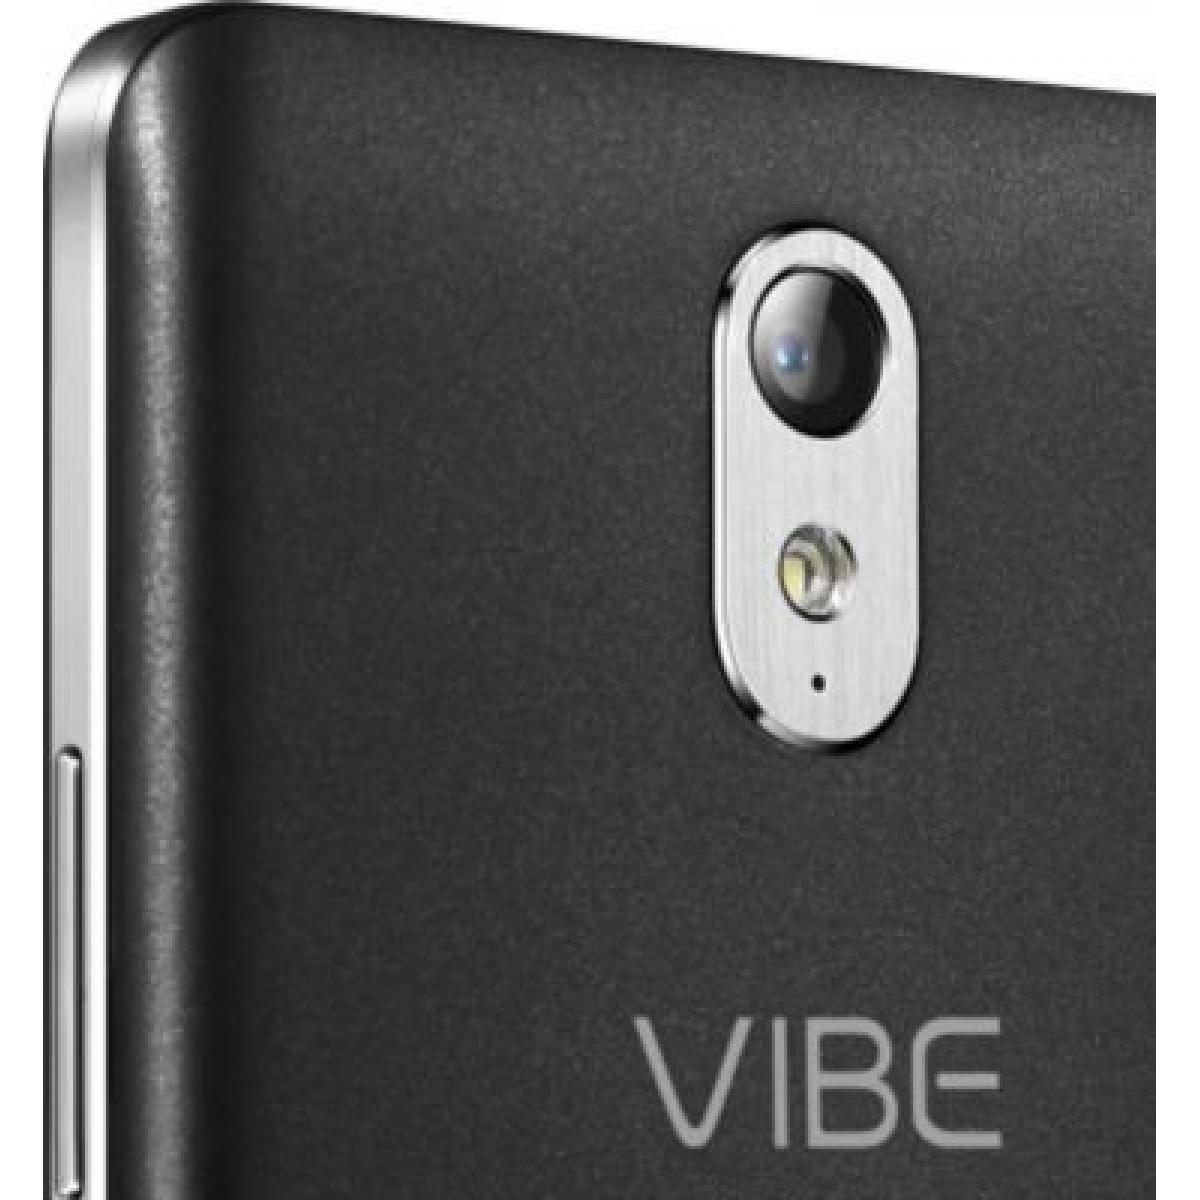 Lenovo VIBE P1m Smartphone 4G Dual Sim , Black